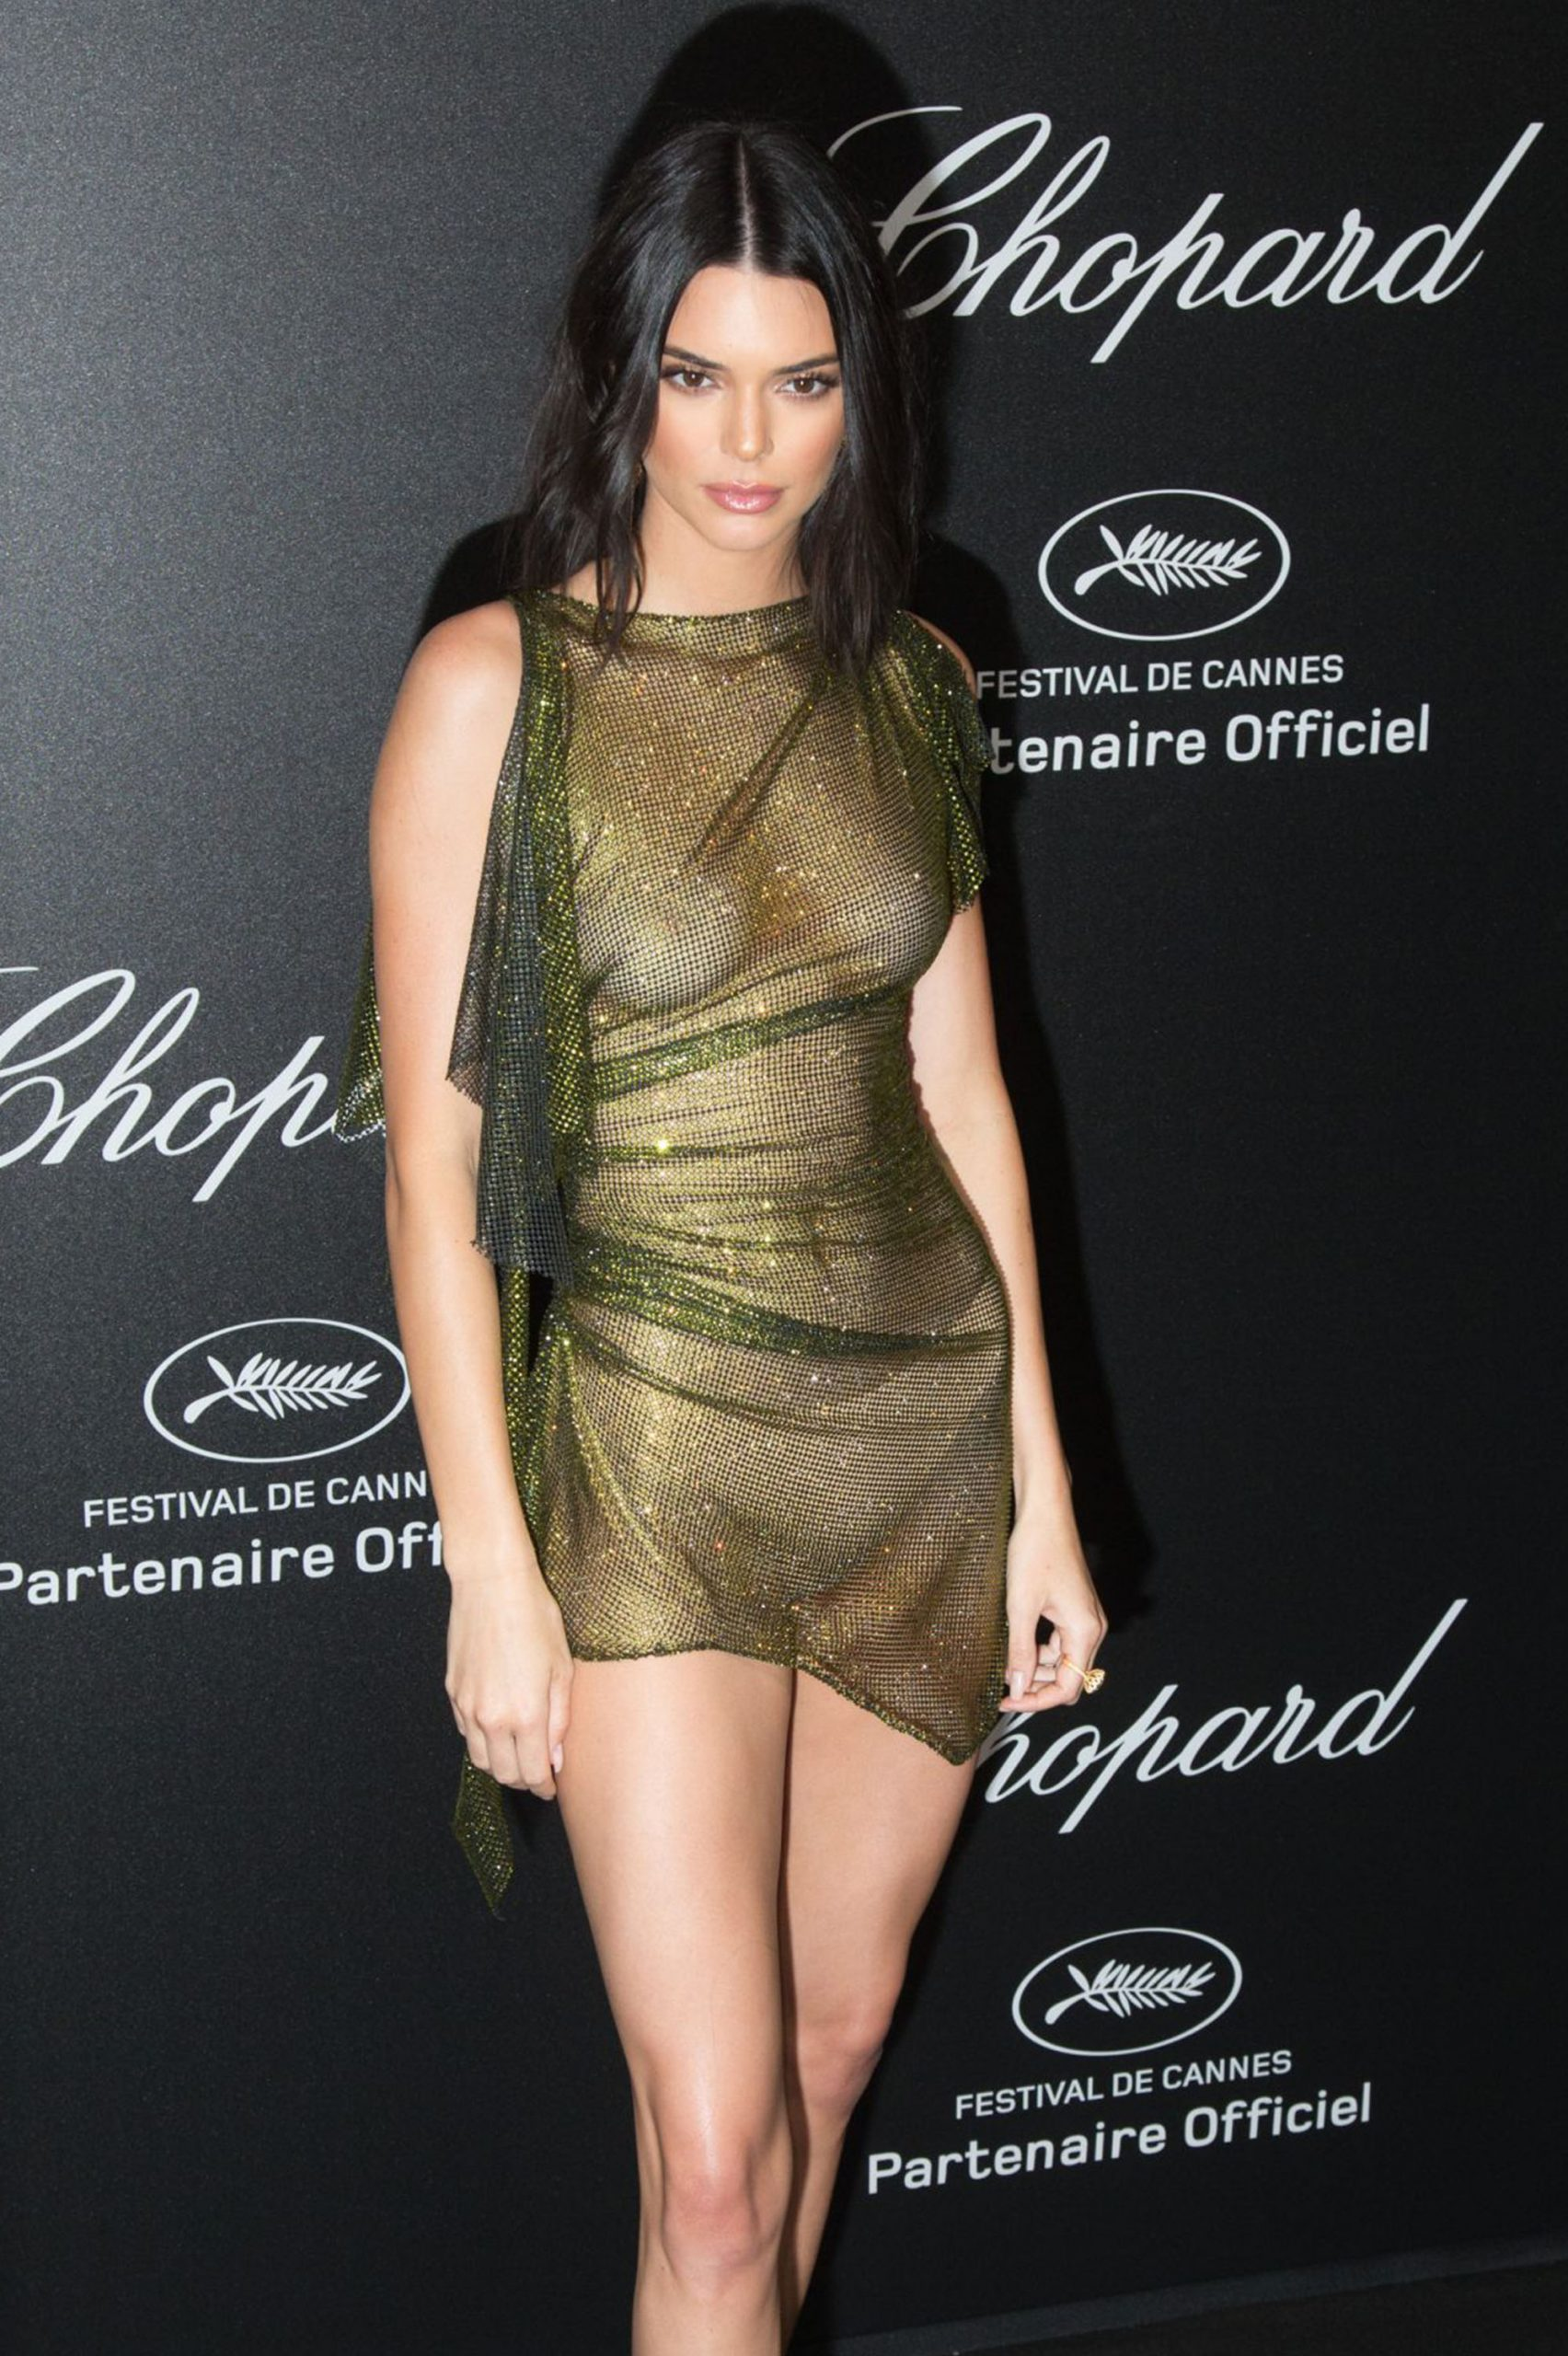 Kendall naked dress - Neomag.